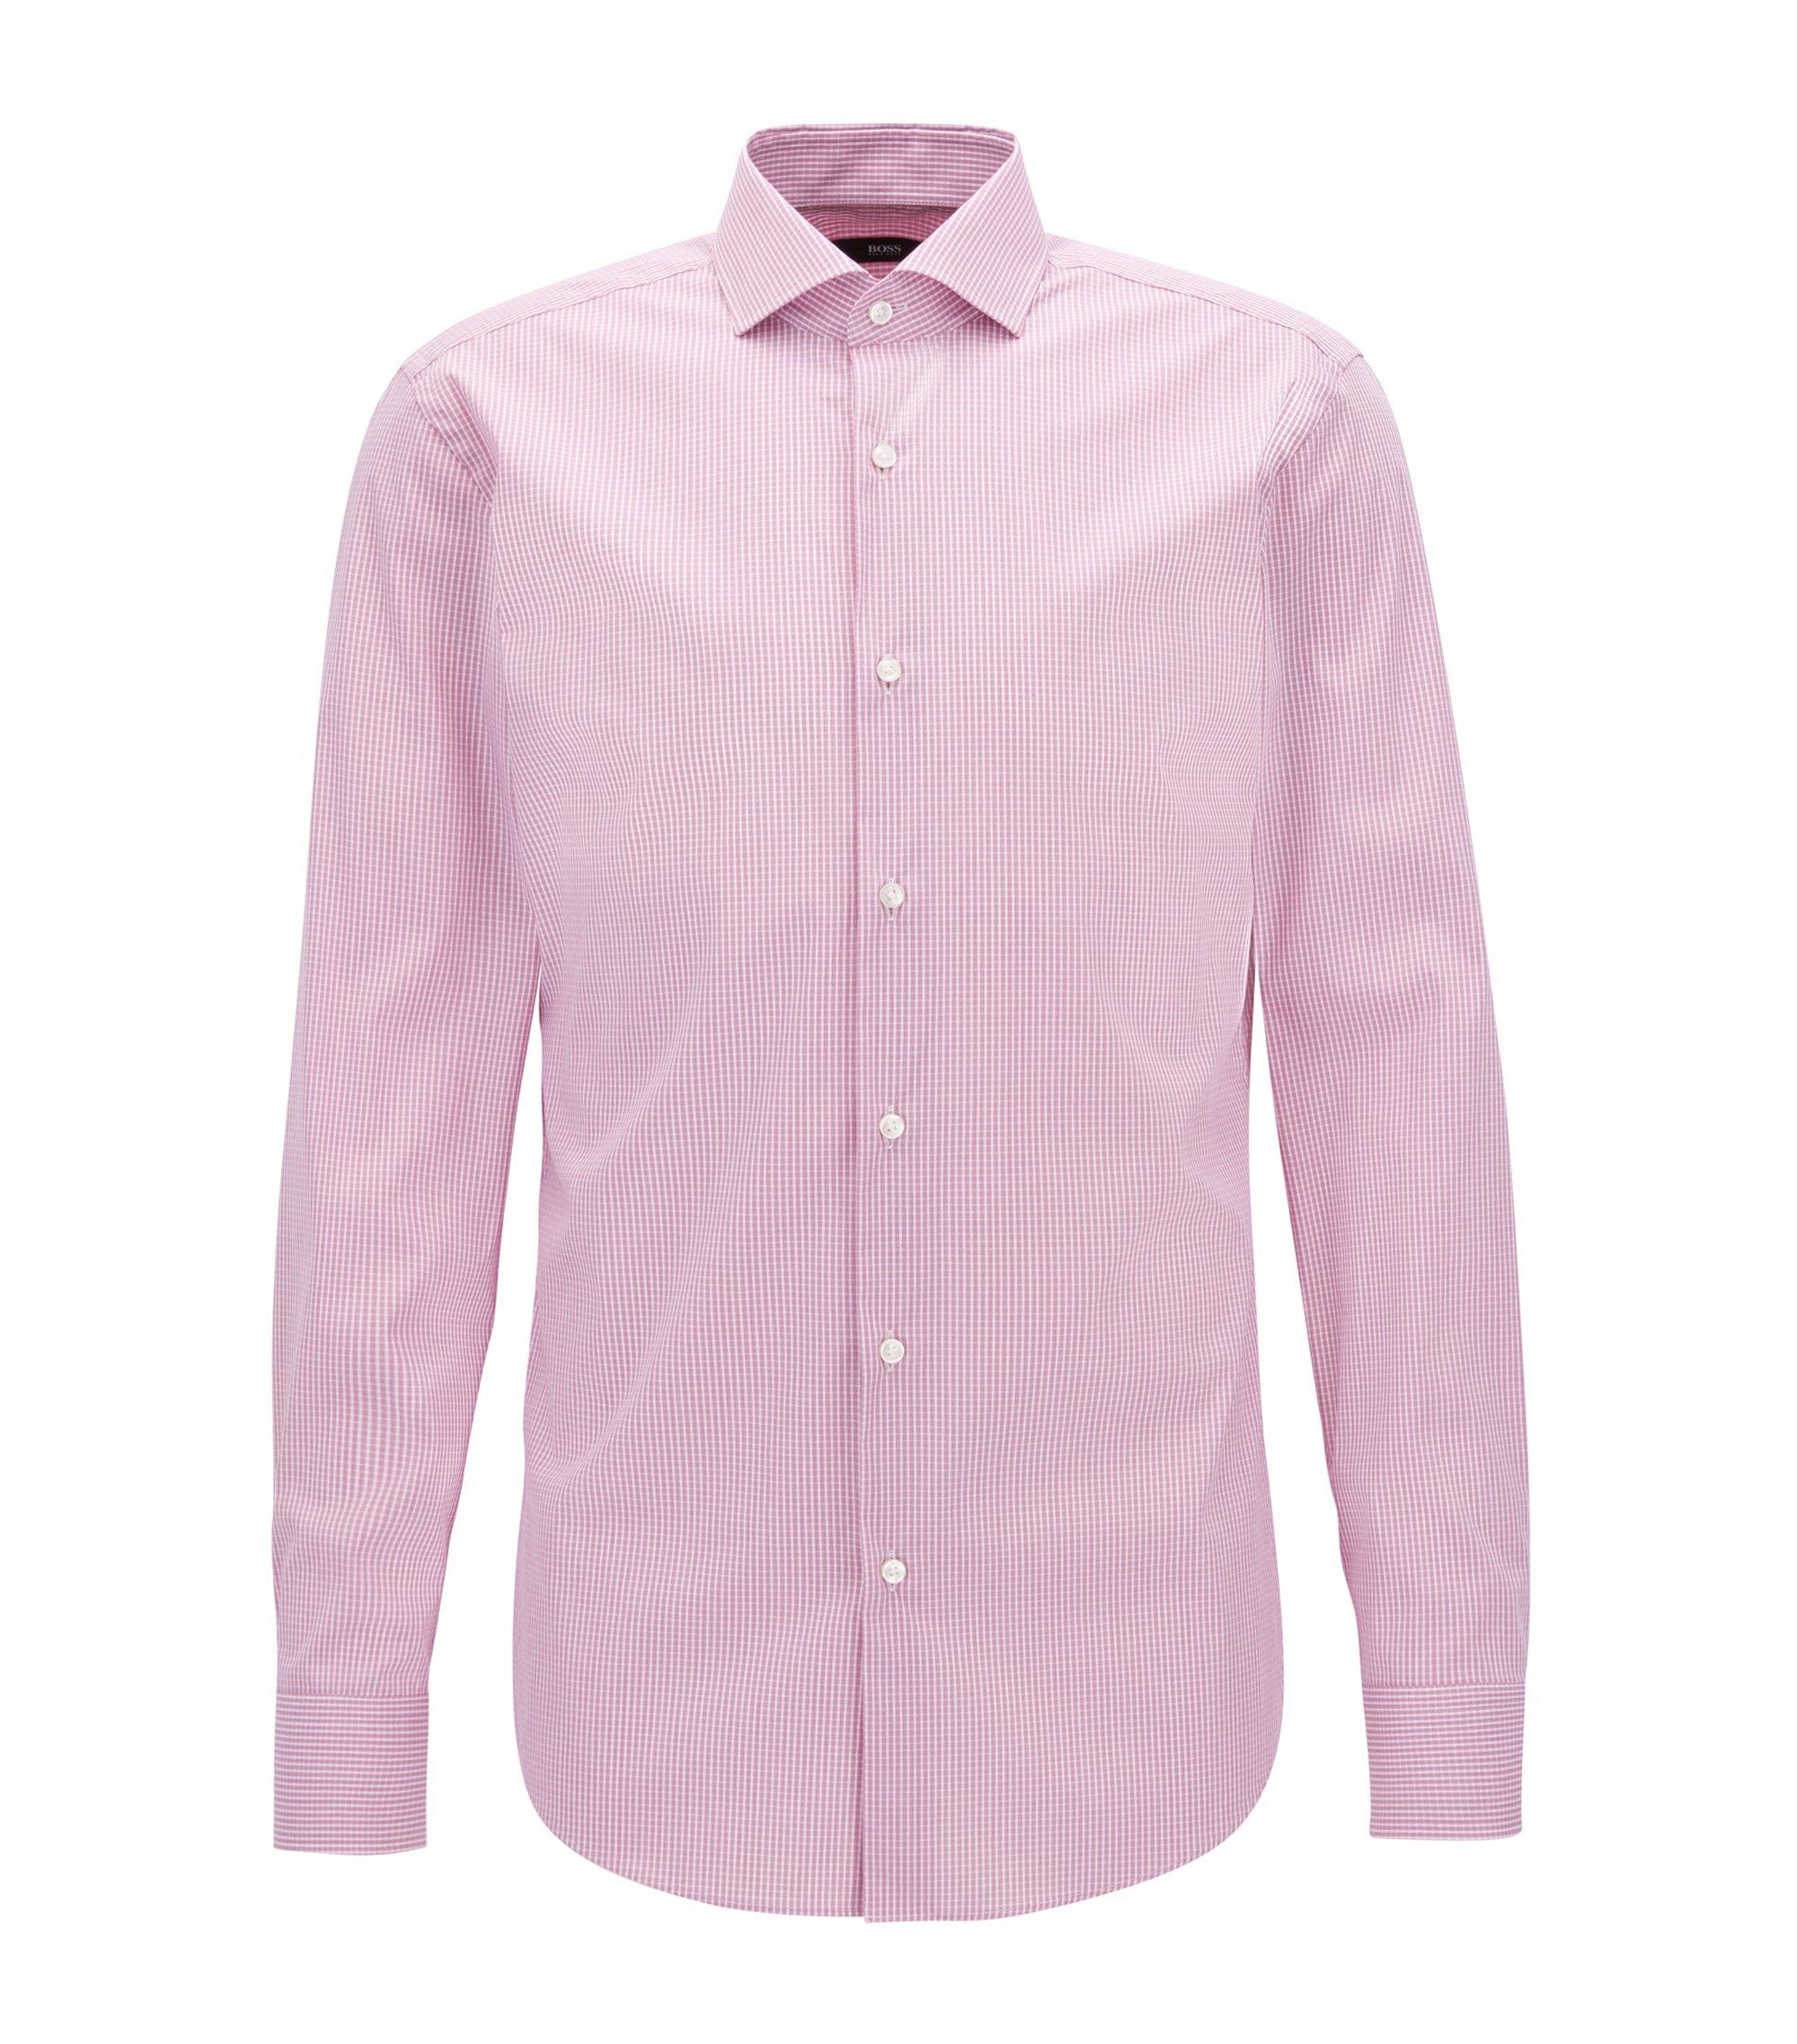 Checked Stretch Cotton Dress Shirt, Slim Fit   Jason, Dark pink